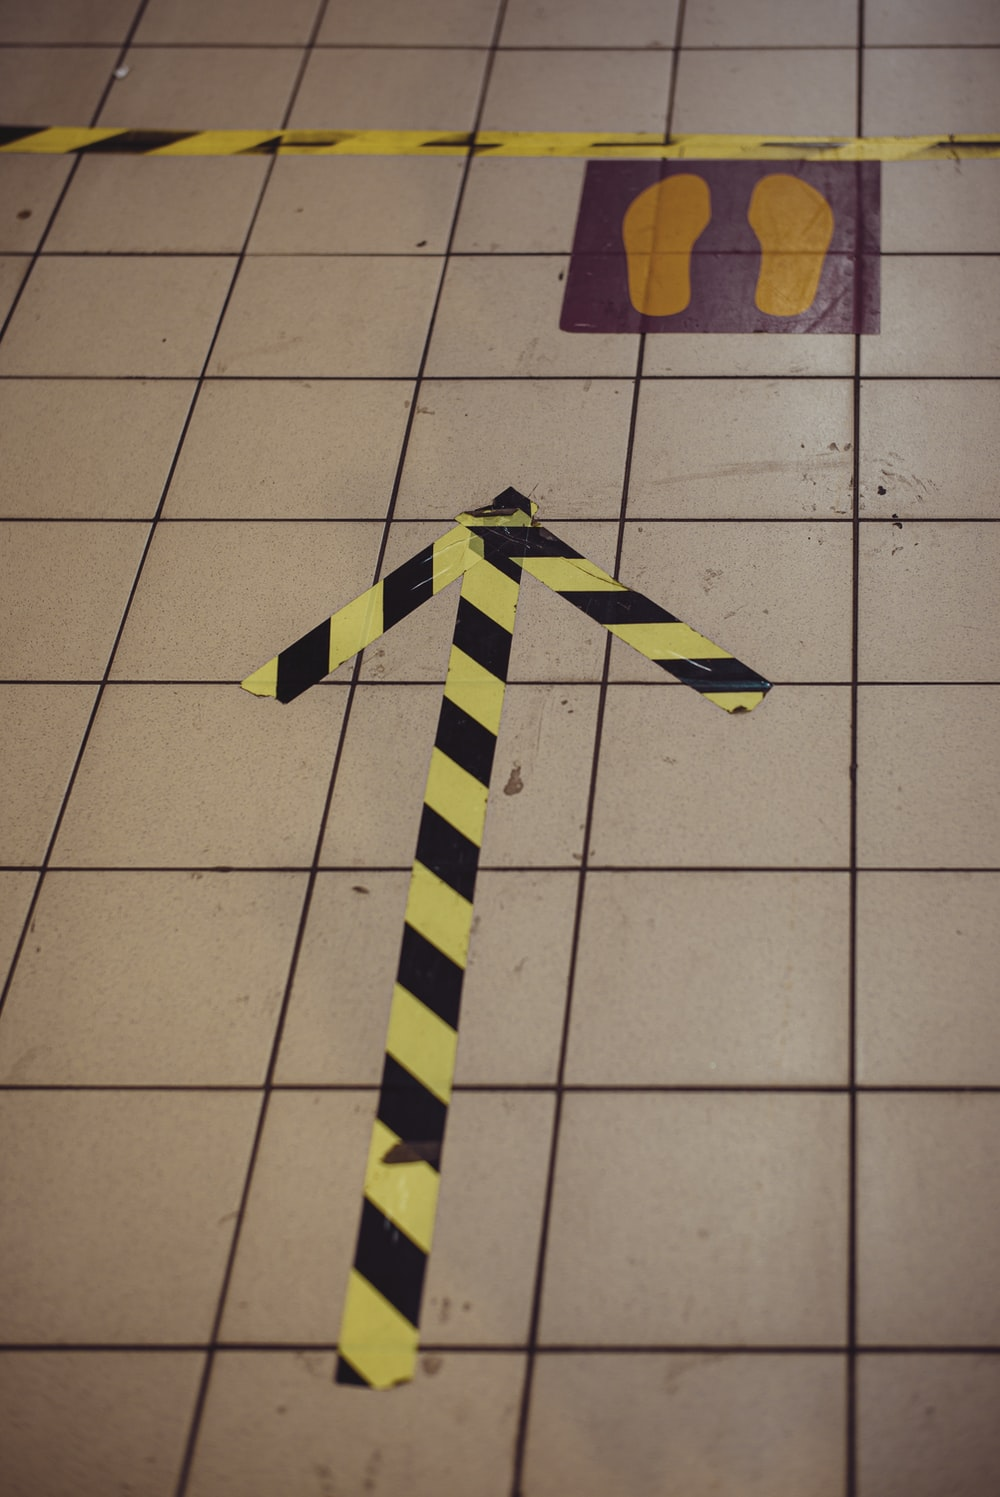 yellow and black cross on white floor tiles